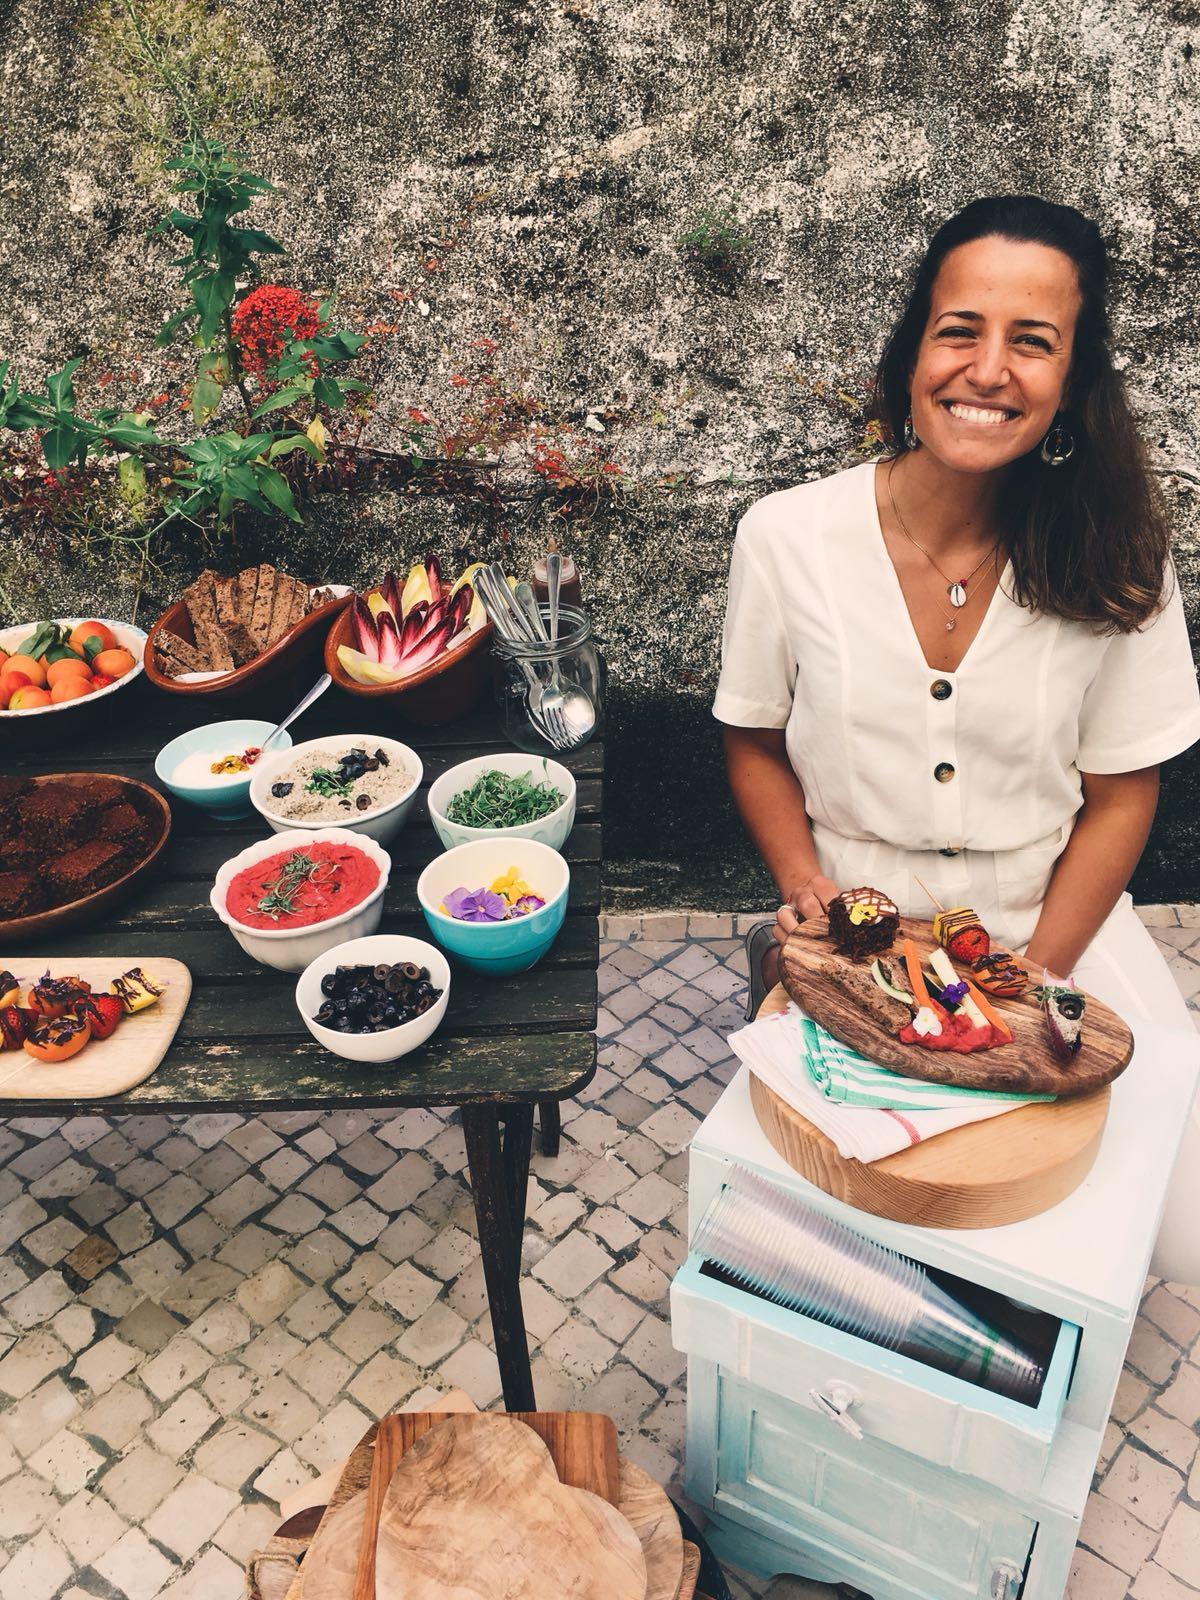 arte no jardim | please consider | joana limao